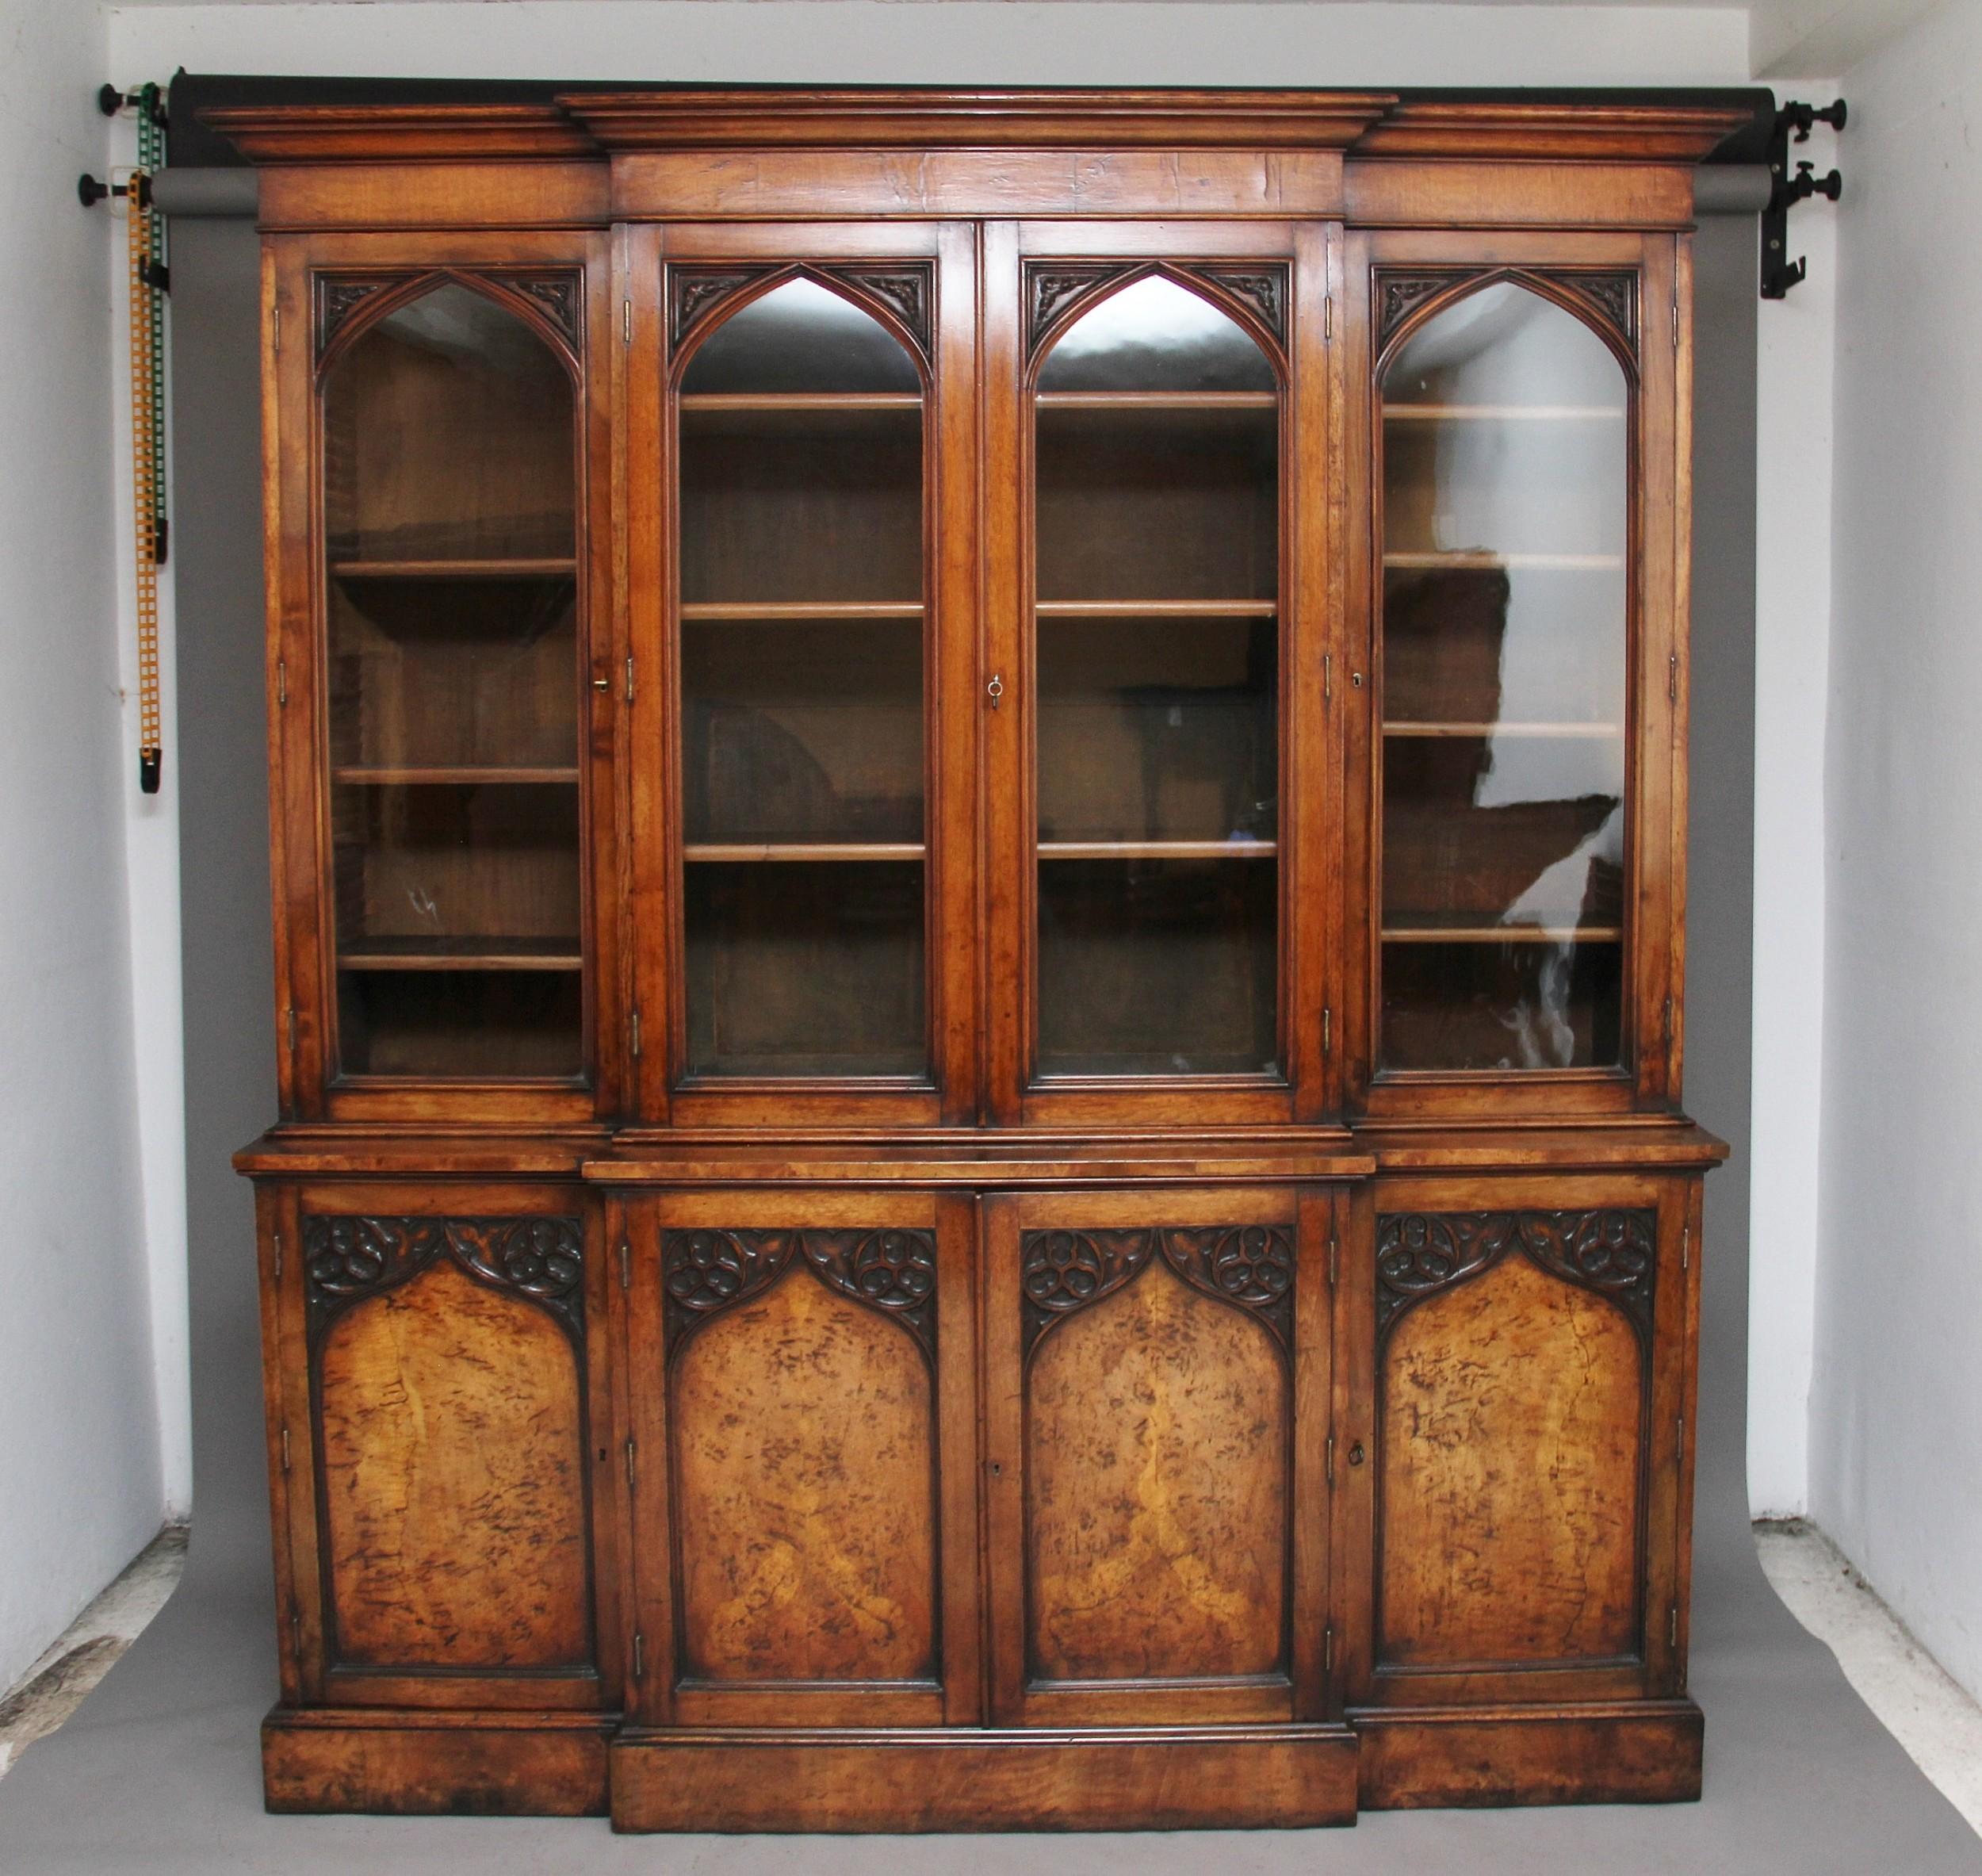 early 19th century pollard oak bookcase